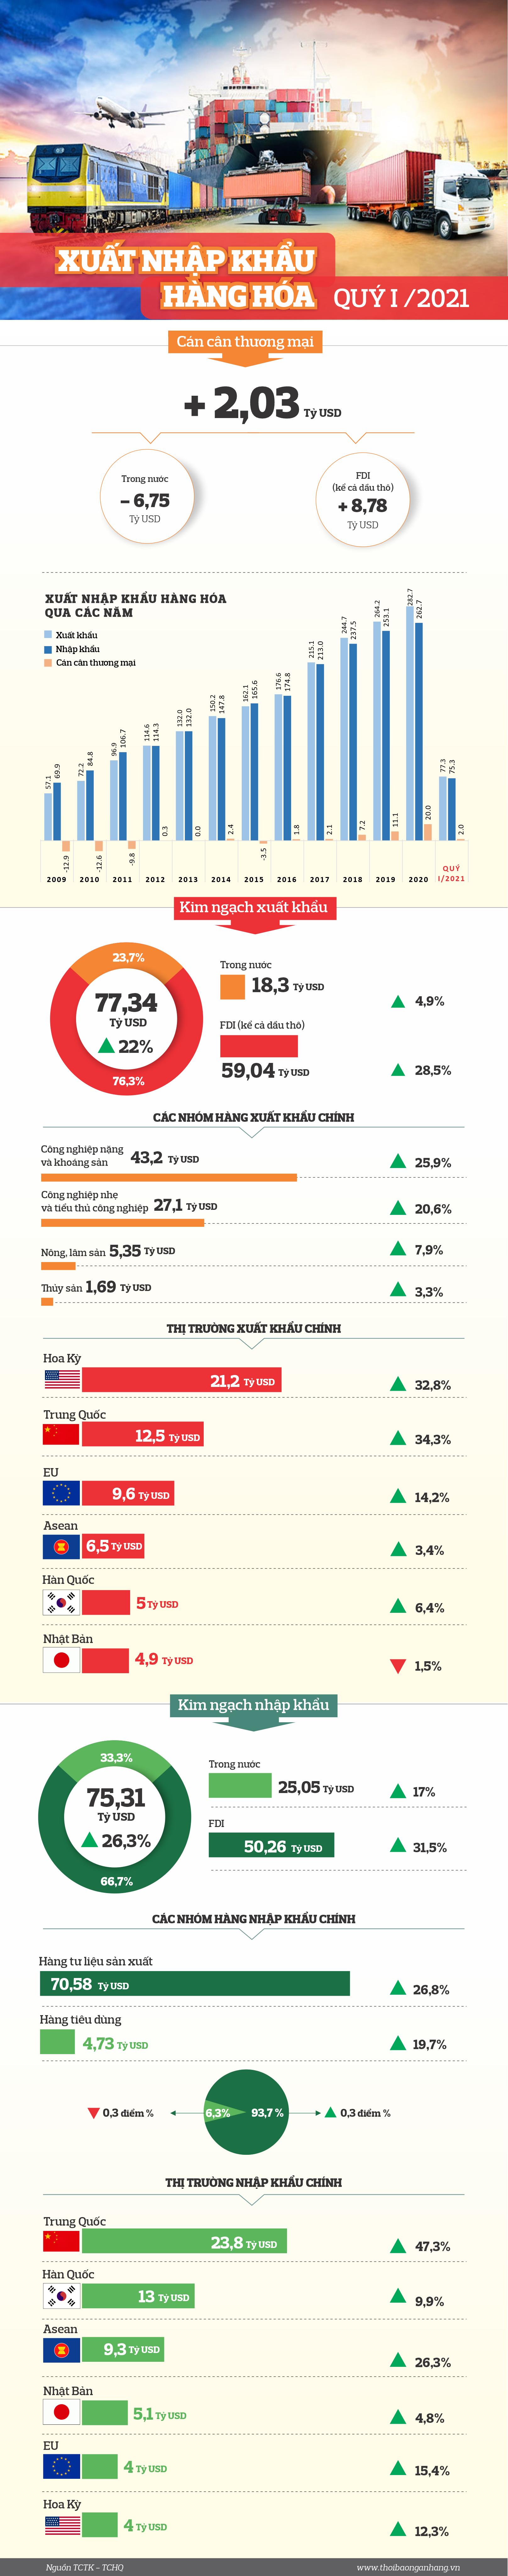 infographic xuat nhap khau hang hoa quy i2021